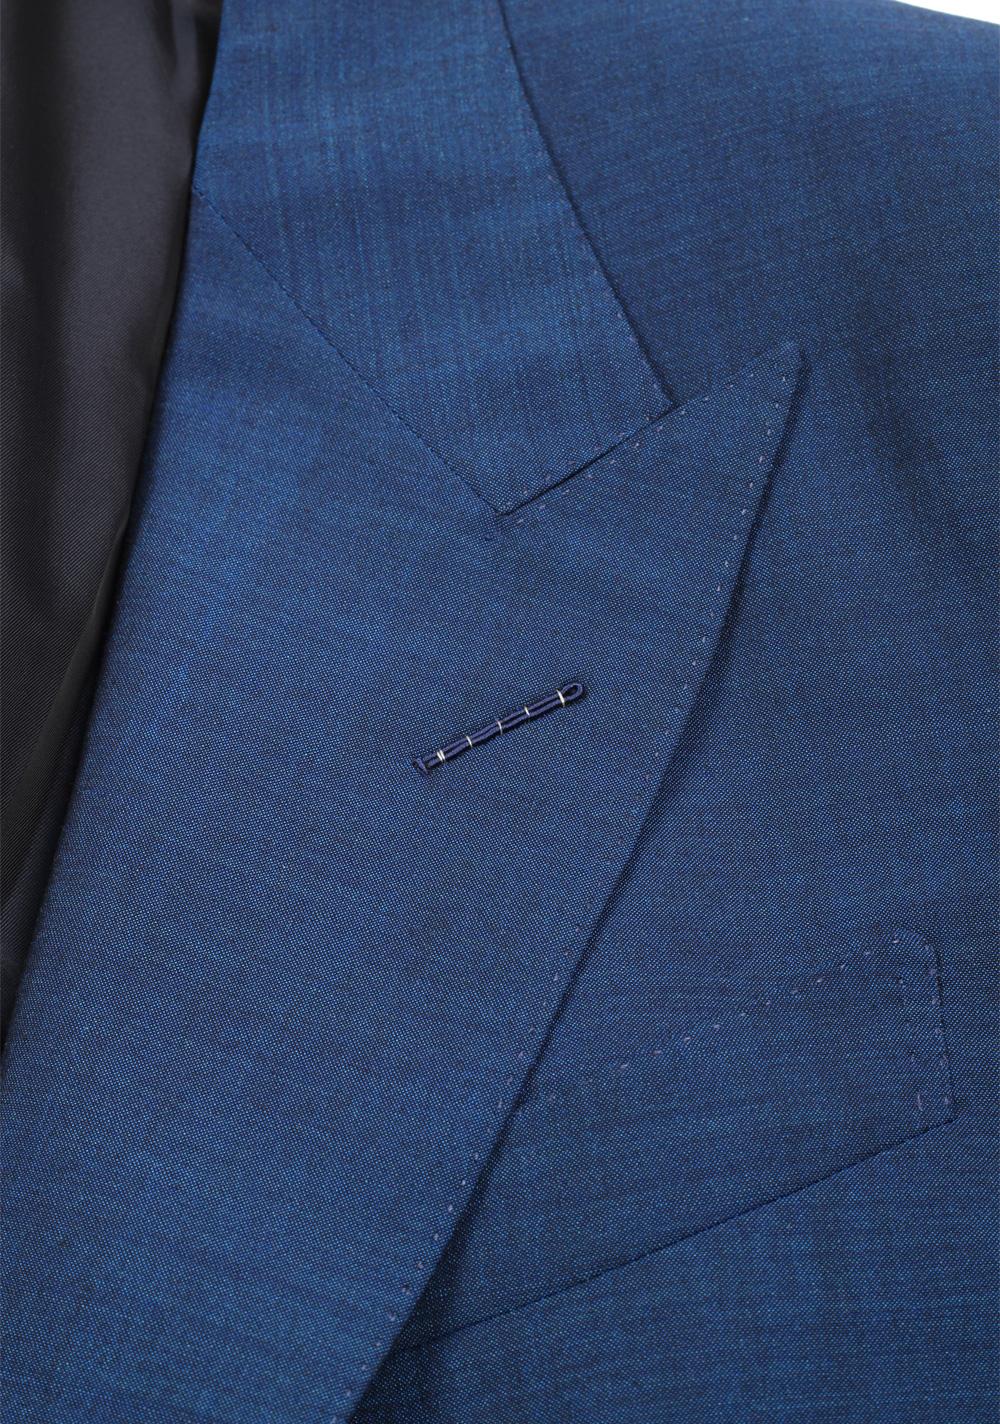 TOM FORD Windsor Solid Blue Suit | Costume Limité